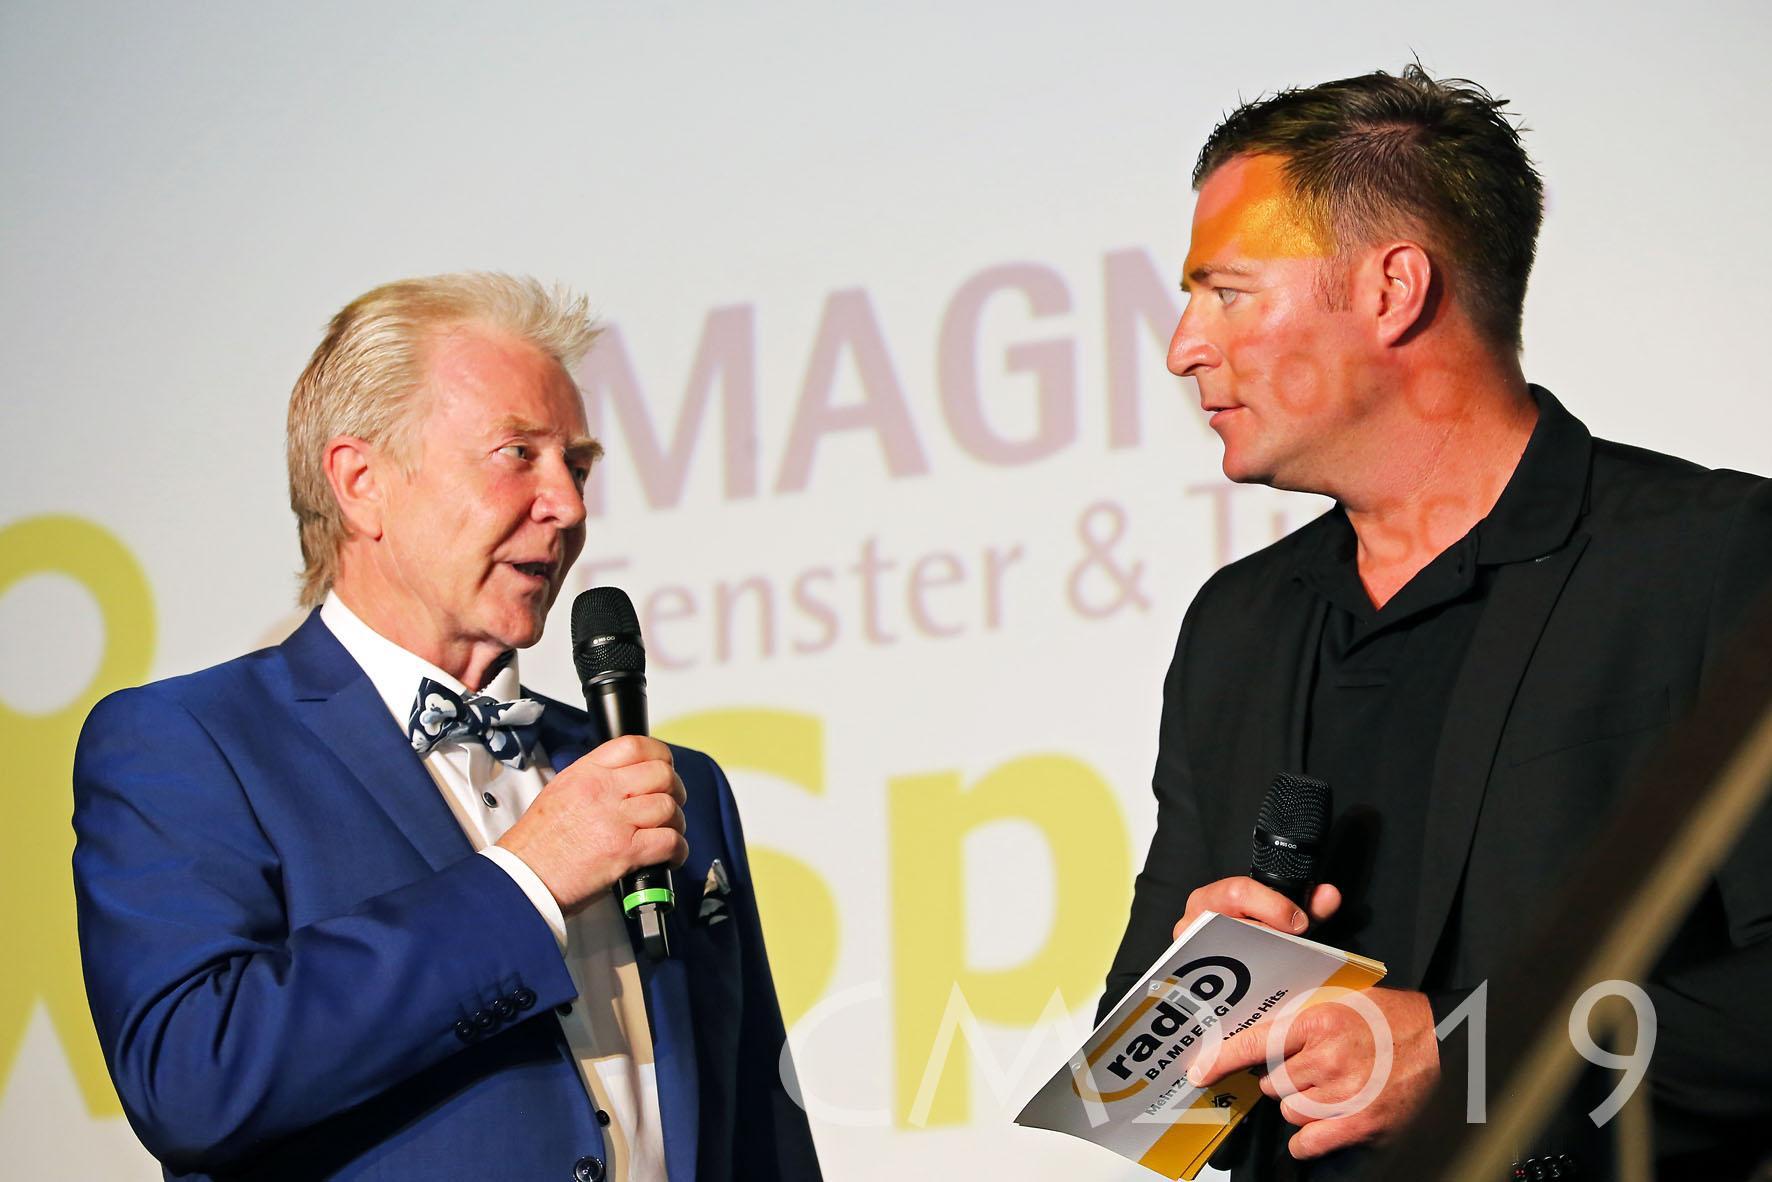 Magnat Sportgala 2019, Wilfried Kämper, Autor: Charlotte Moser